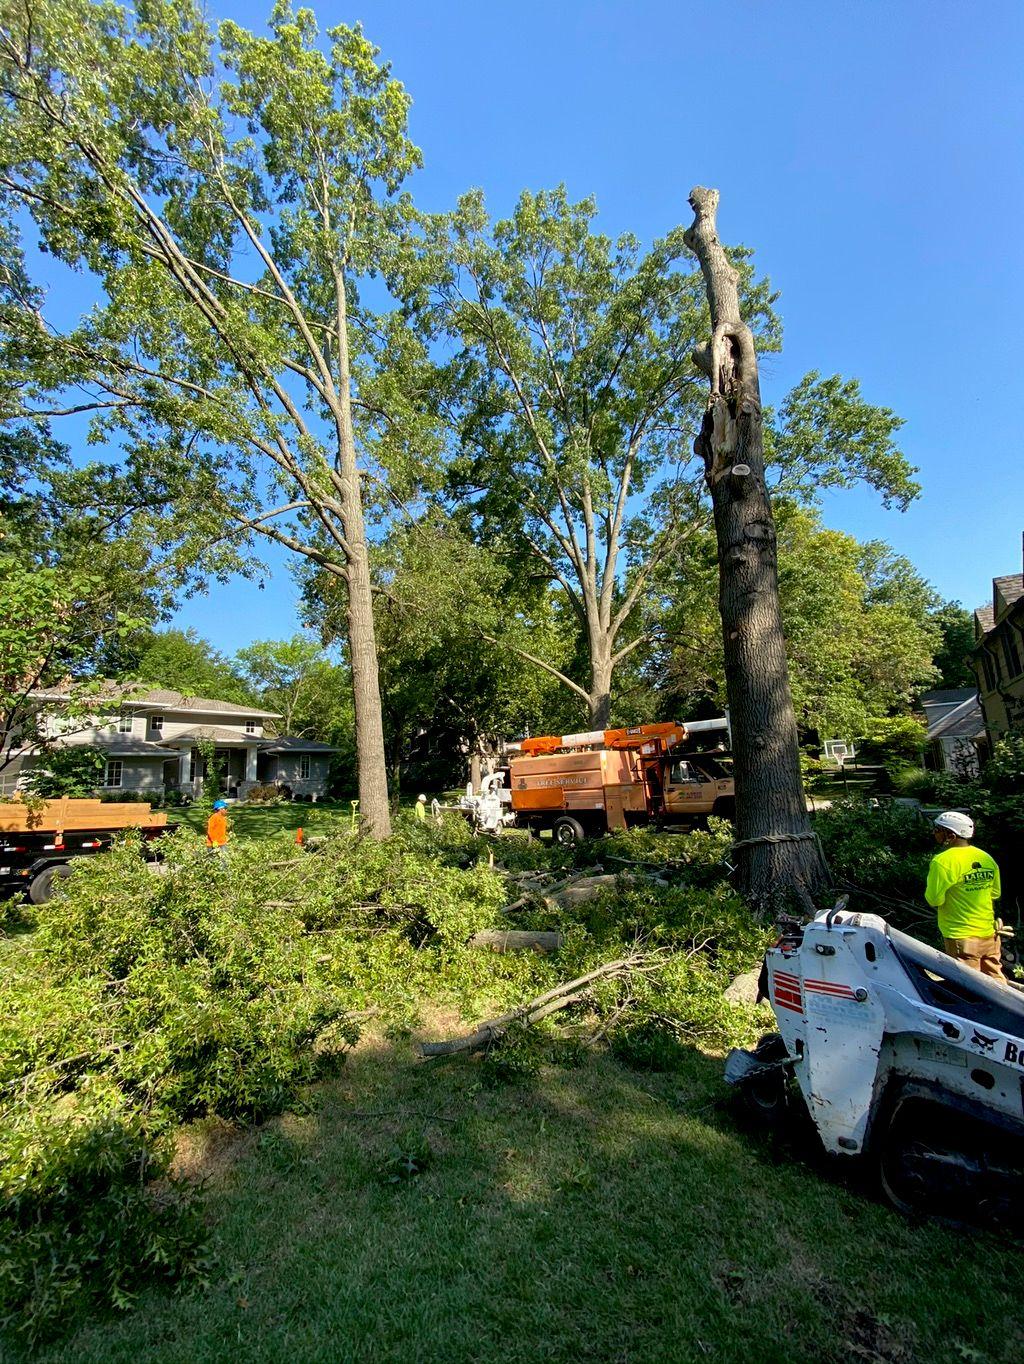 Larin tree service